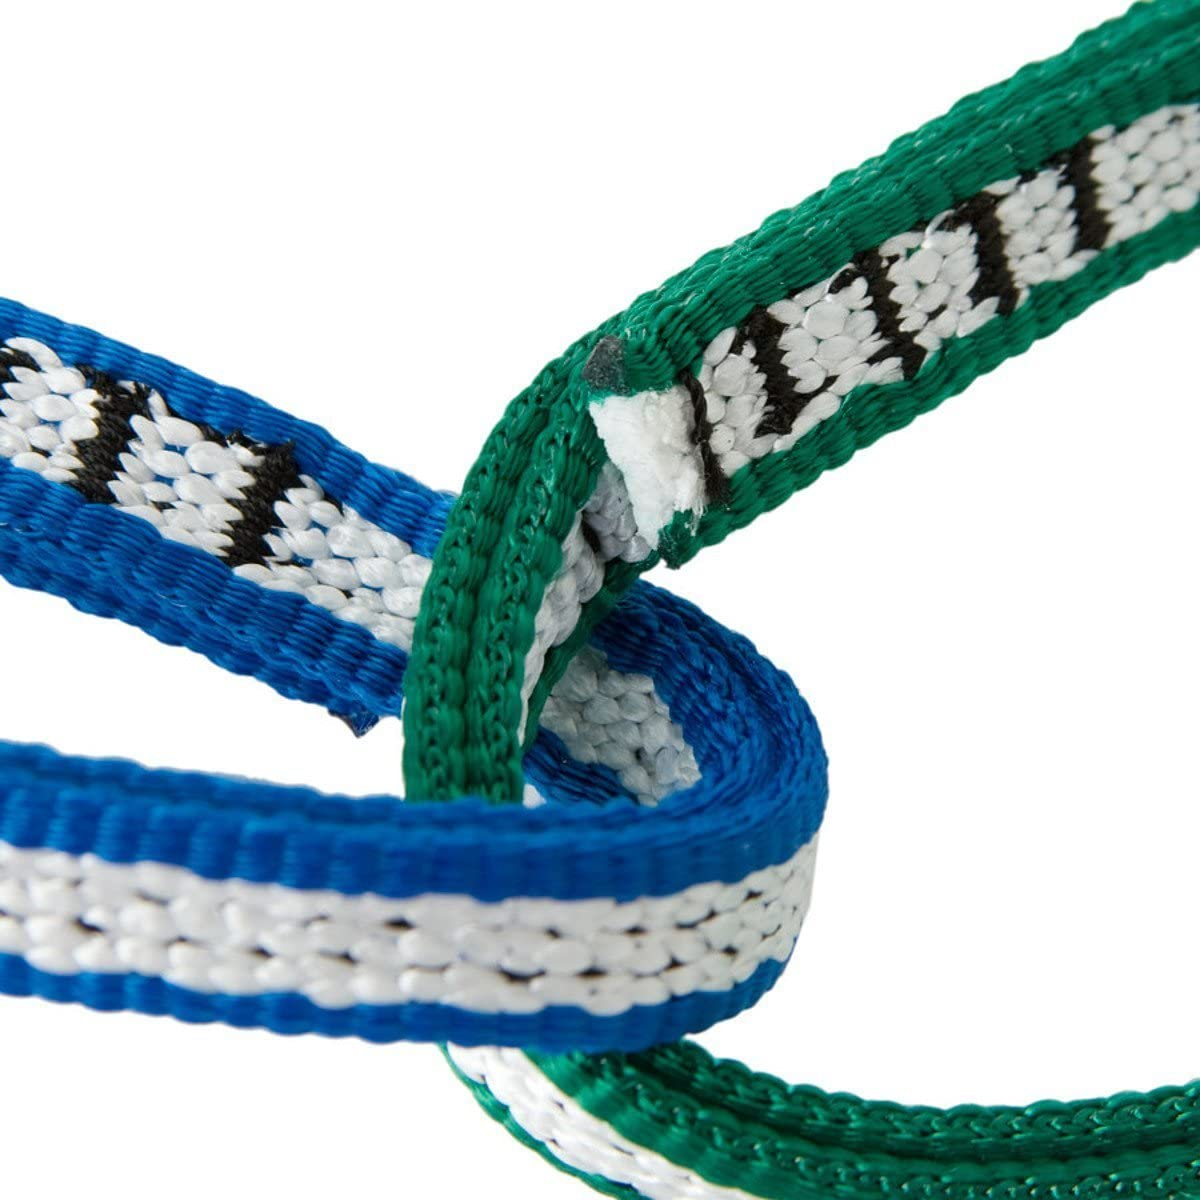 Metolius – ULTIMATE Daisy Chain (Azul y Verde)